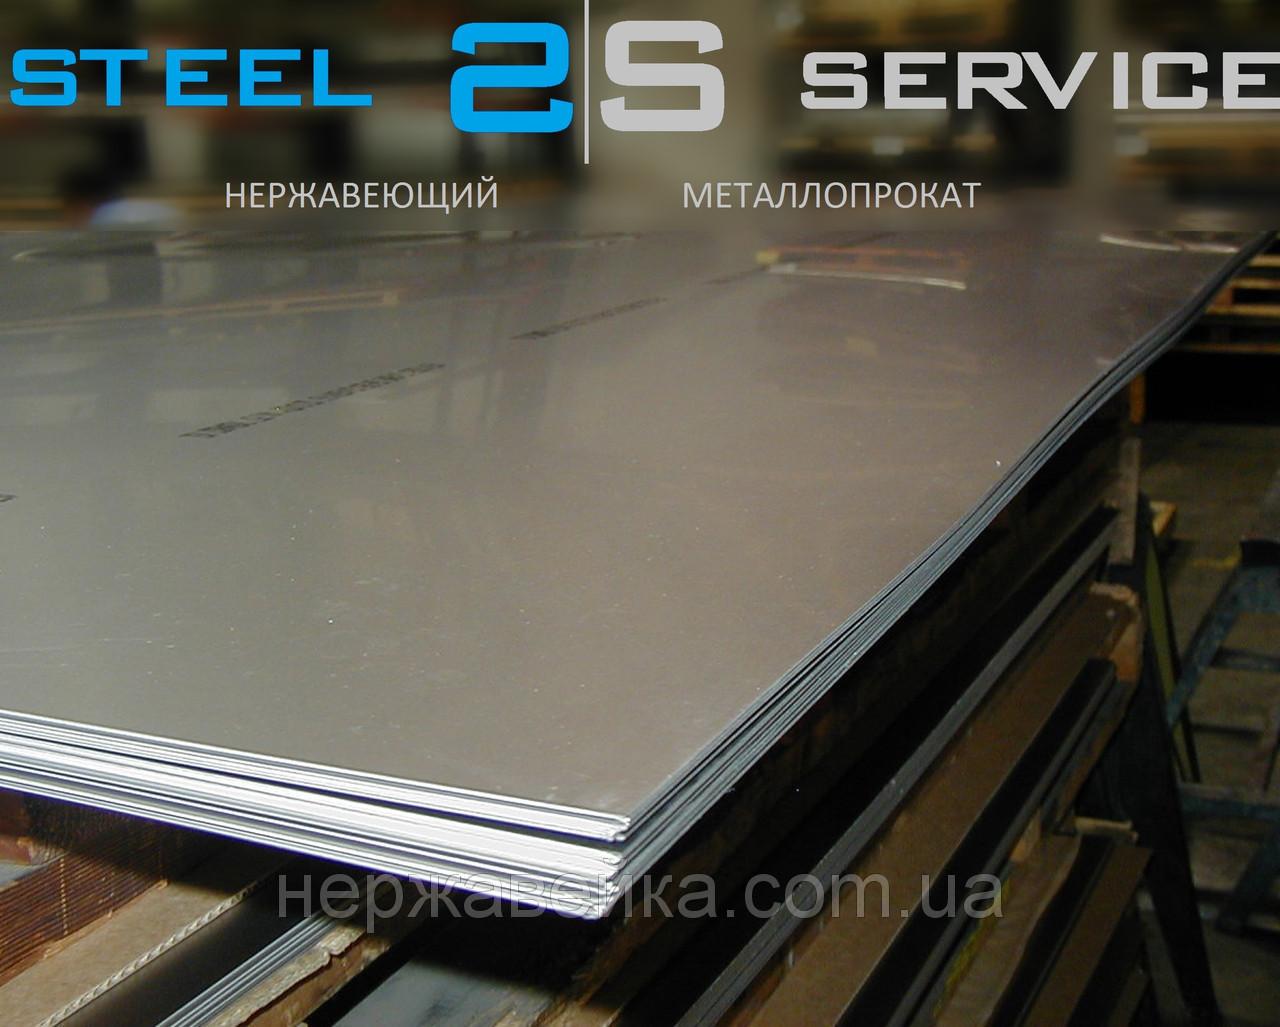 Нержавейка лист 1х1500х3000мм AISI 430(12Х17) 2B - матовый, технический